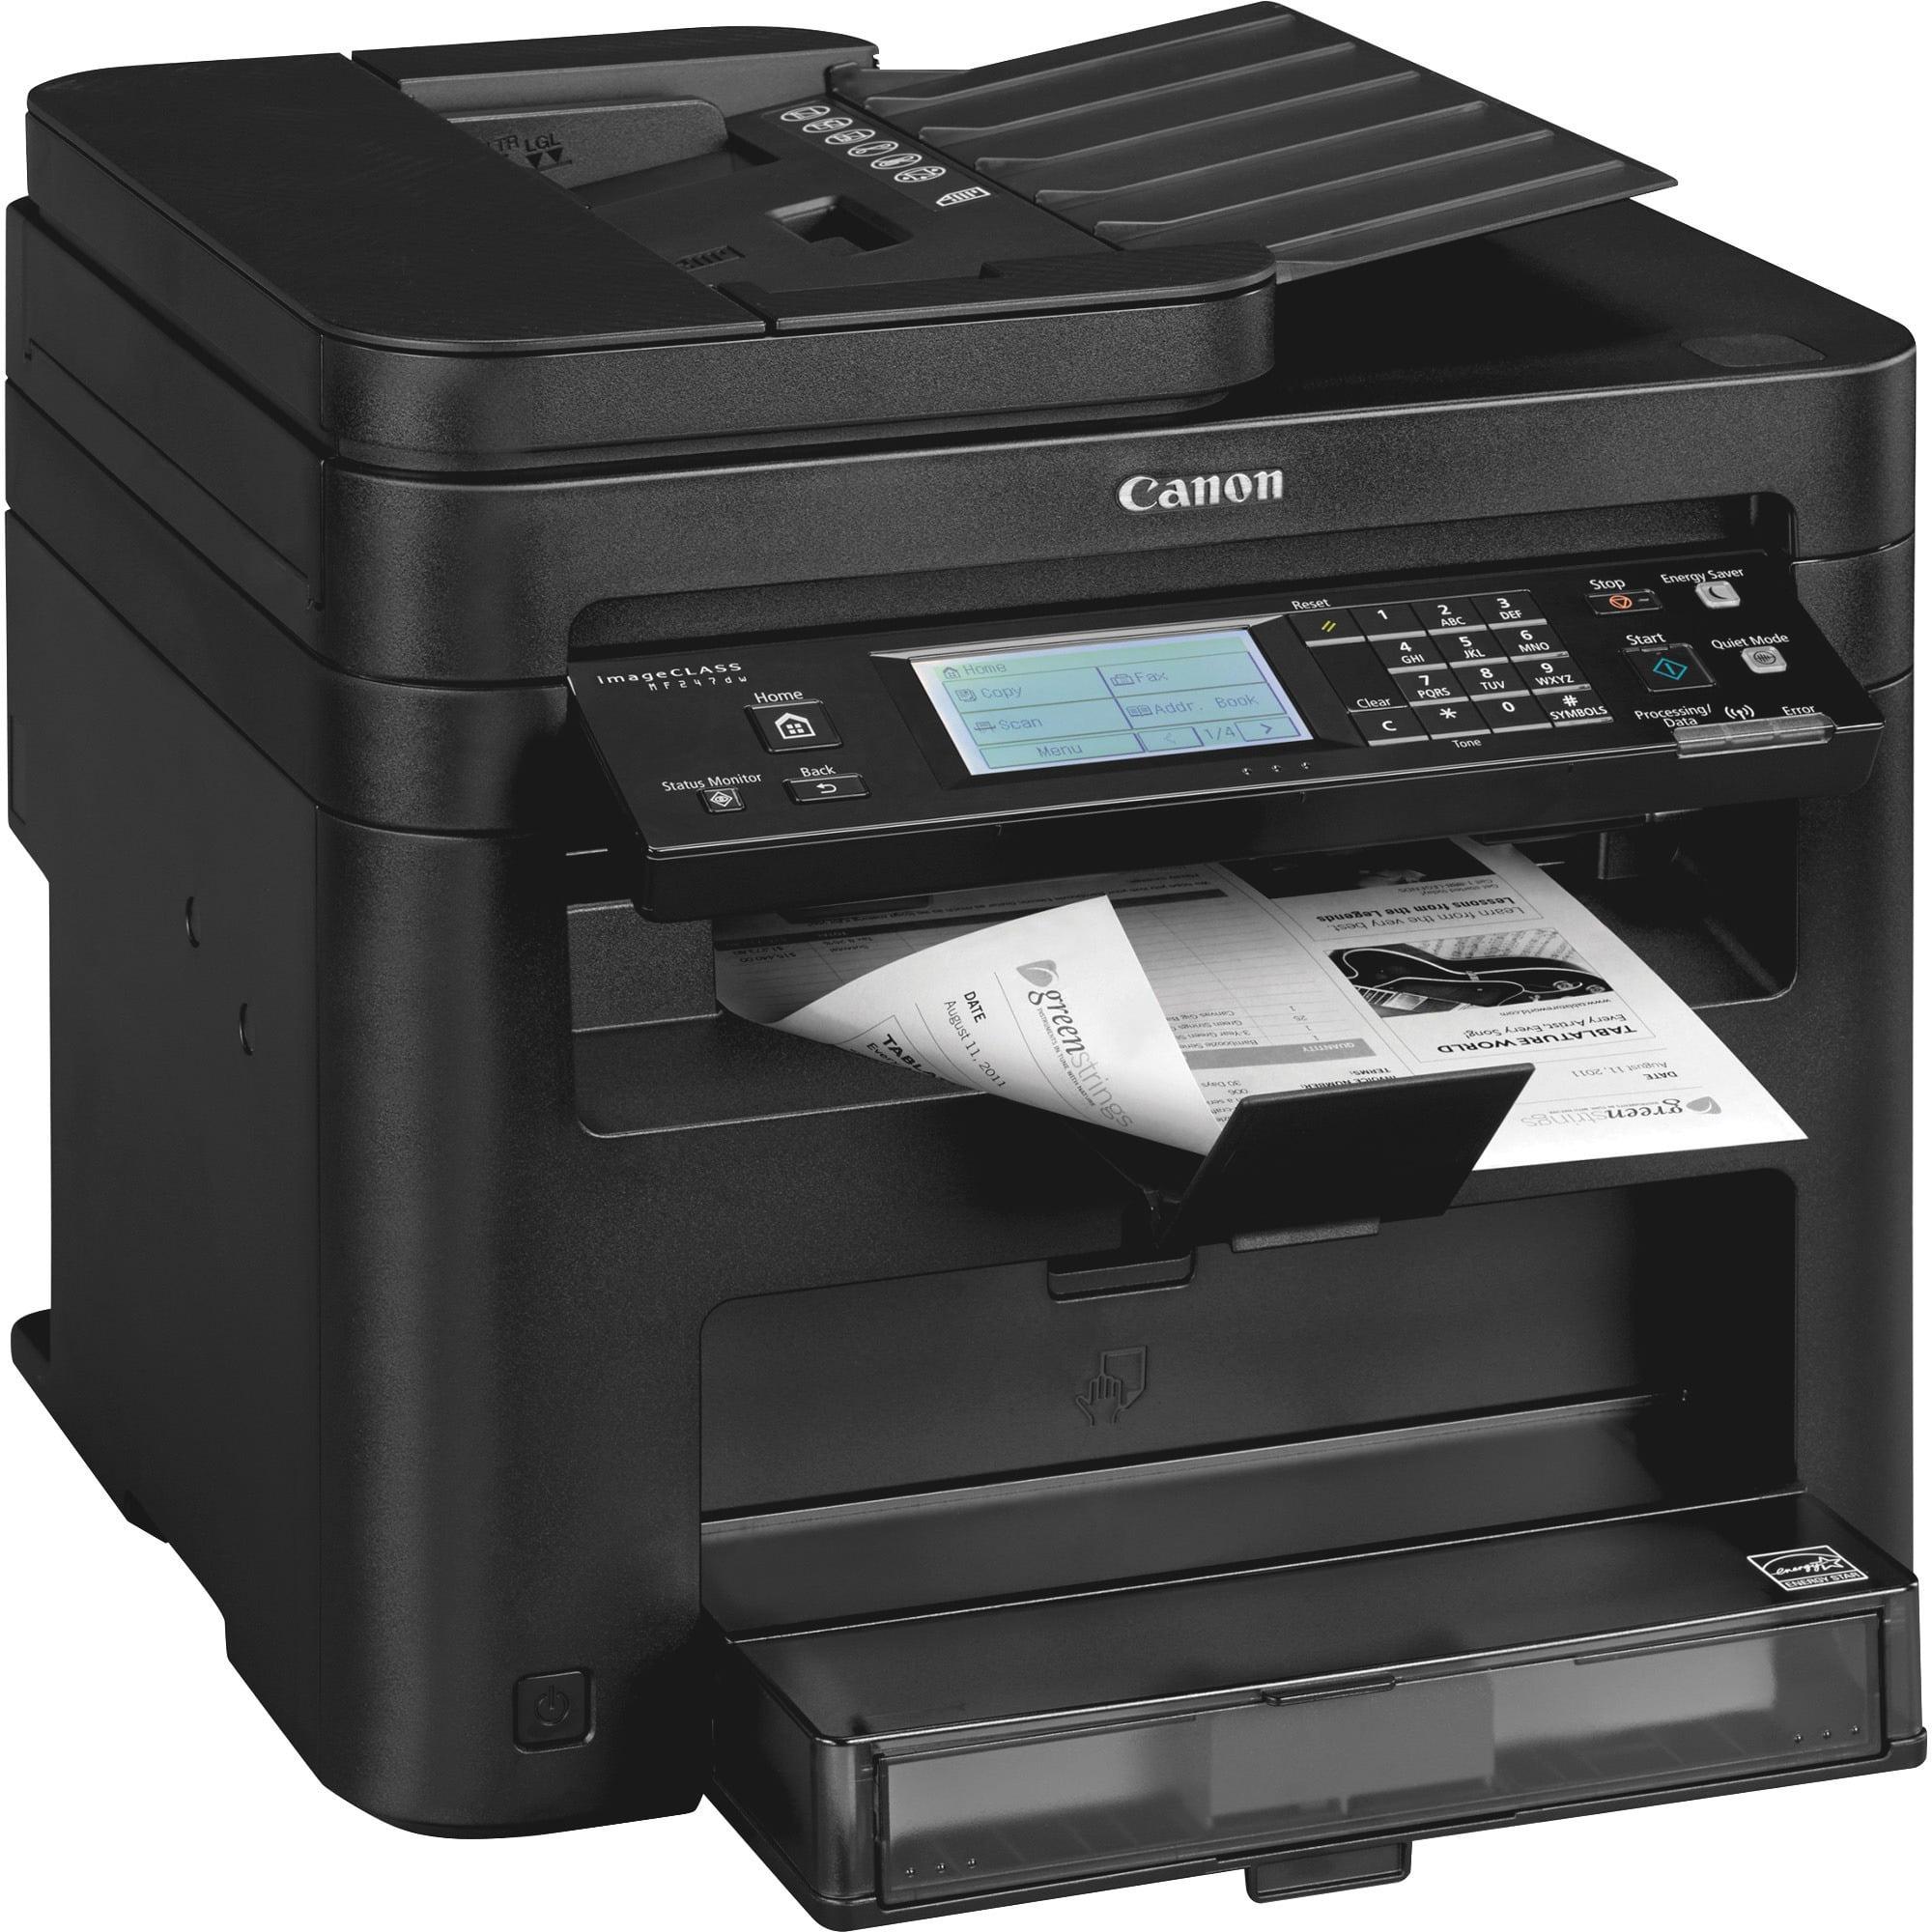 Canon imageCLASS MF247dw All-in-1 Laser Printer